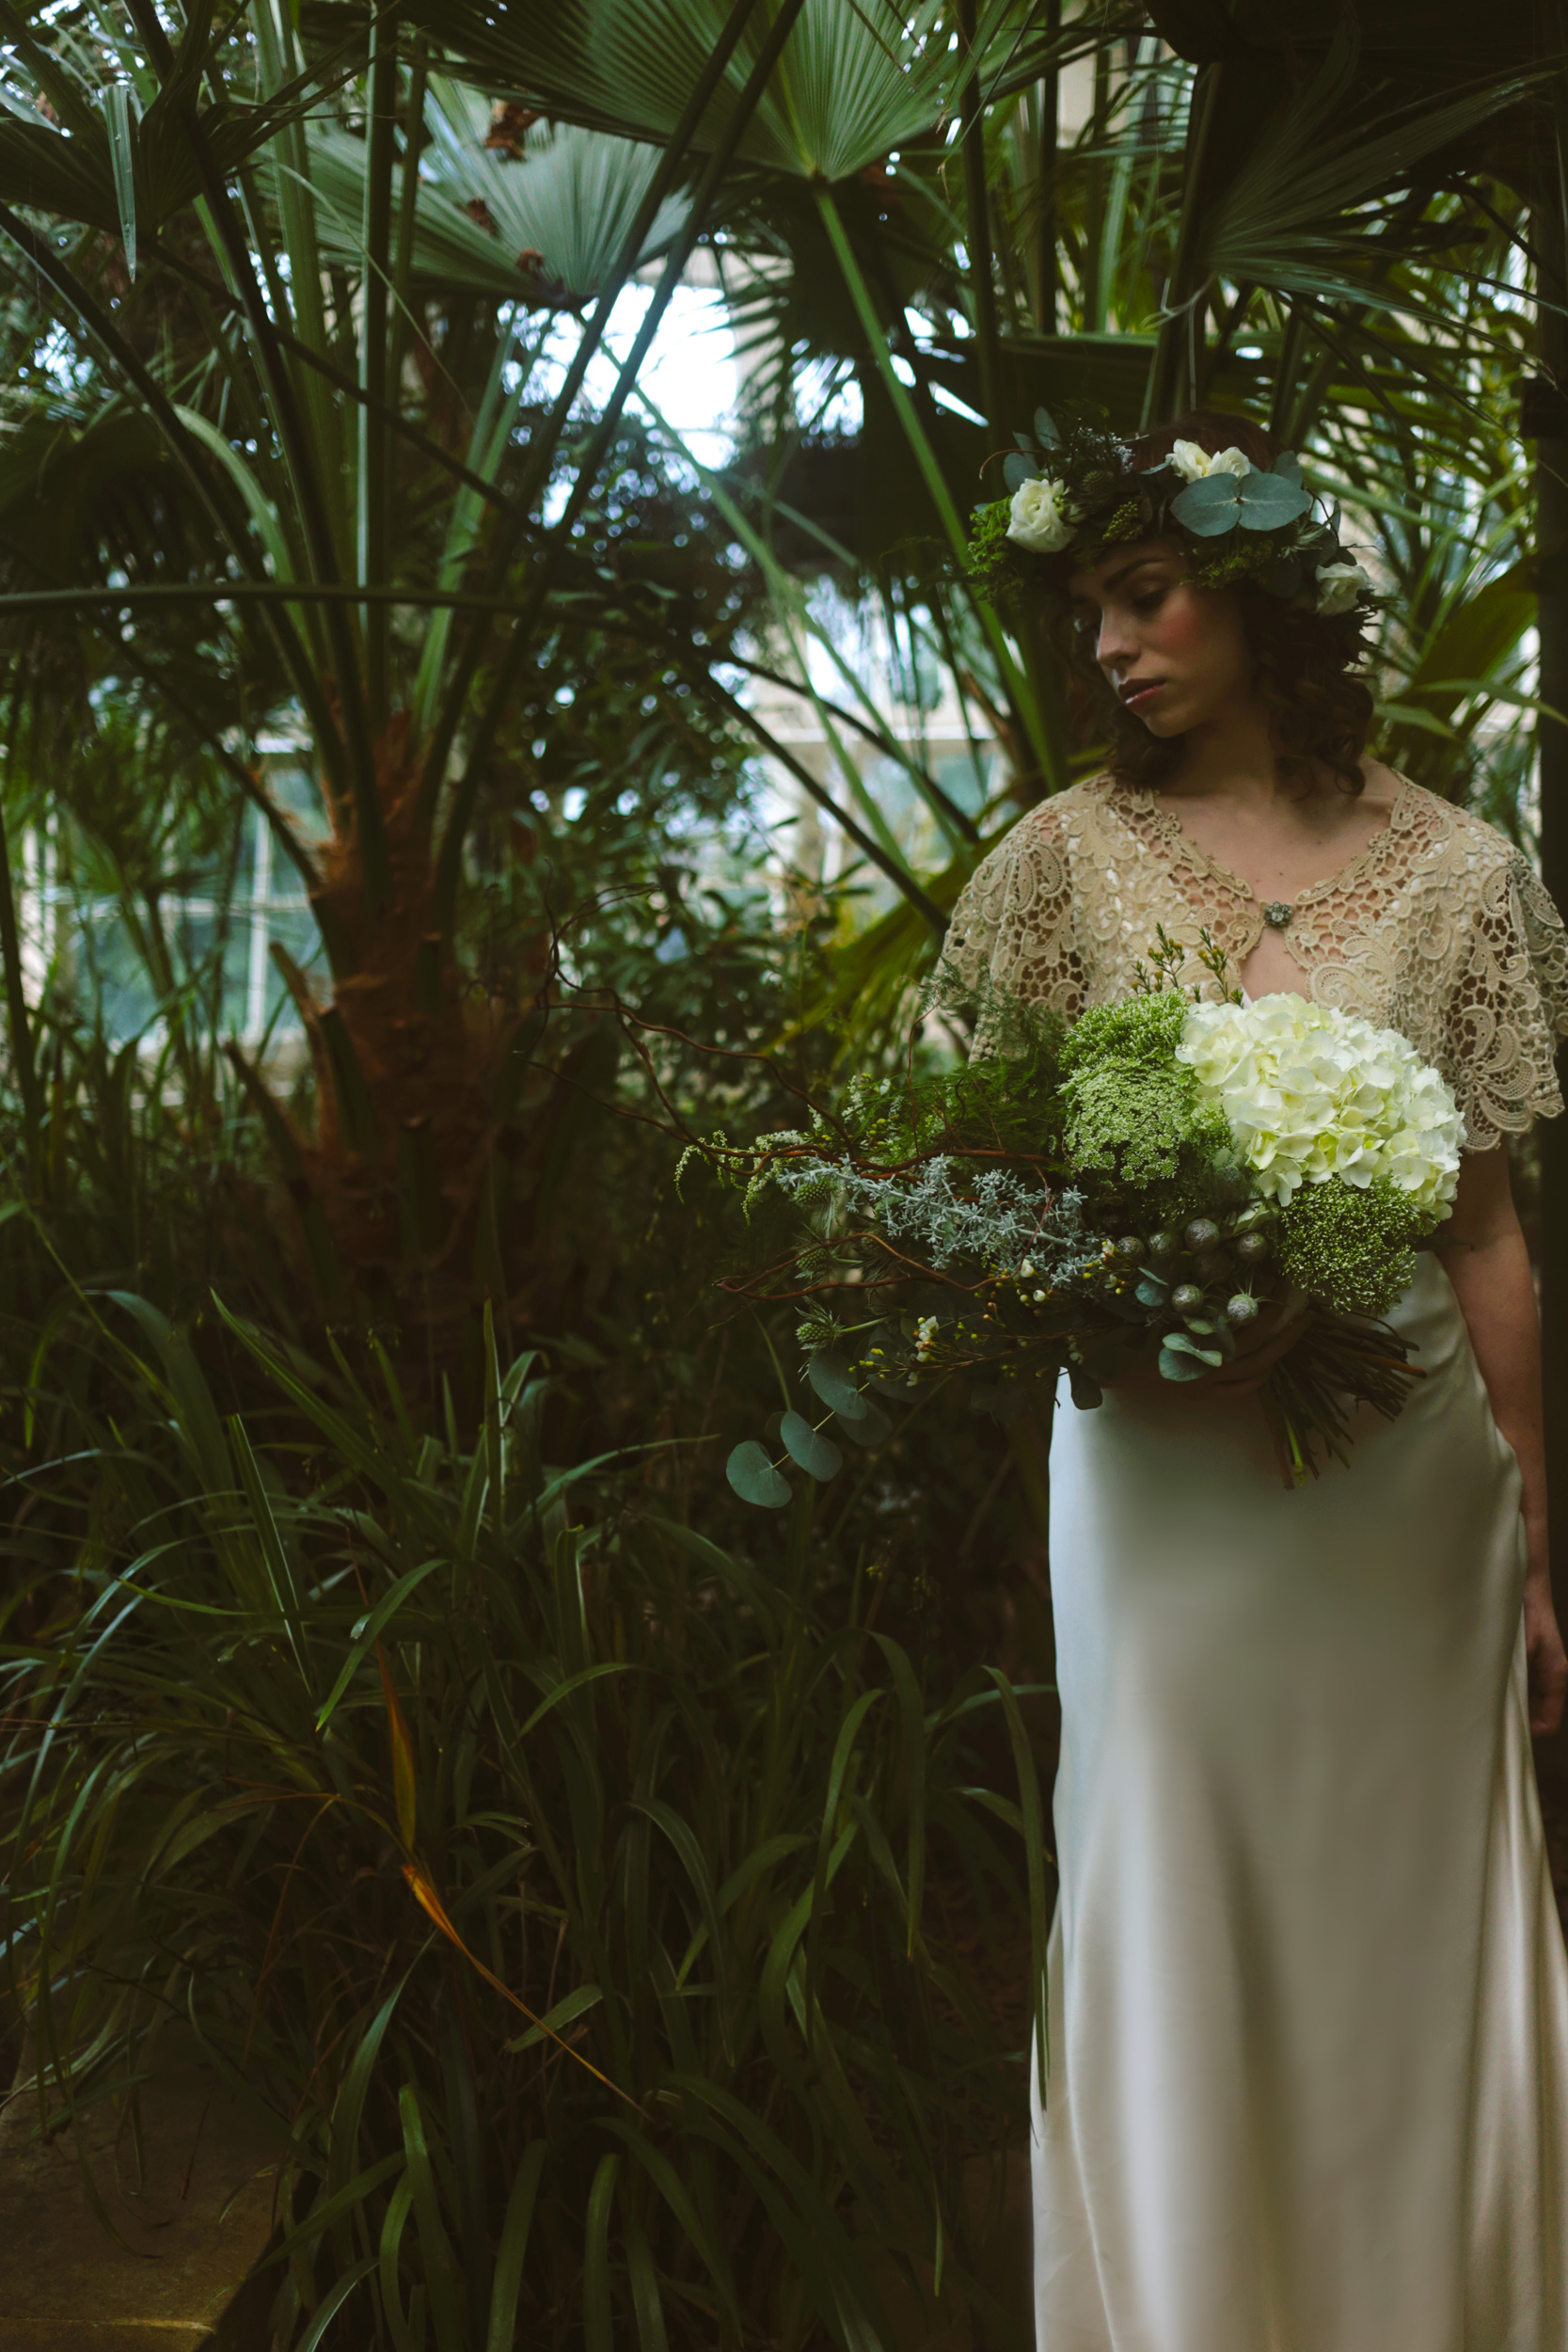 Winter-Bridal-Kate-Beaumont-Shelley-Richmond-Vintage-Wedding-Dress-14.jpg